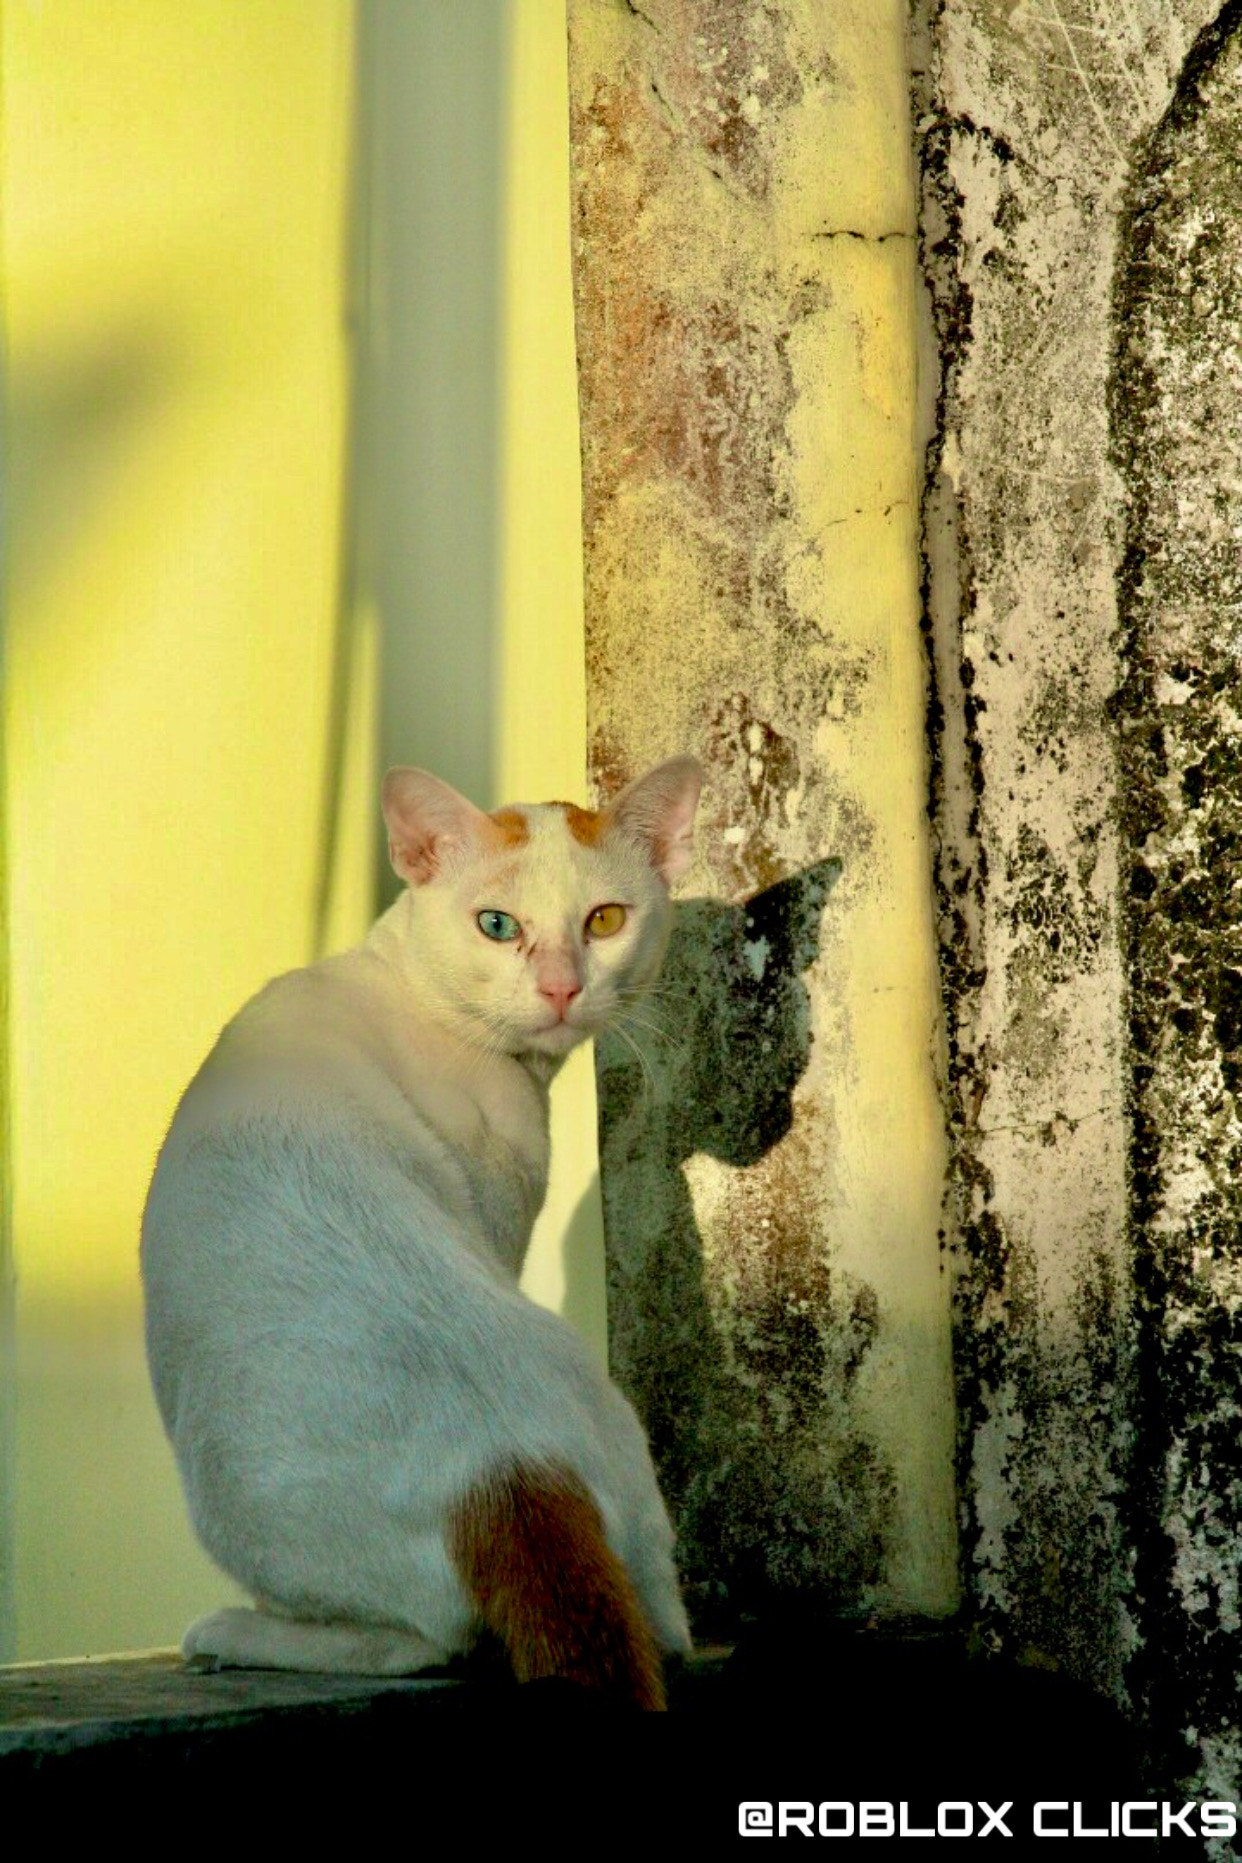 Look at the cat eyes ✨❤️